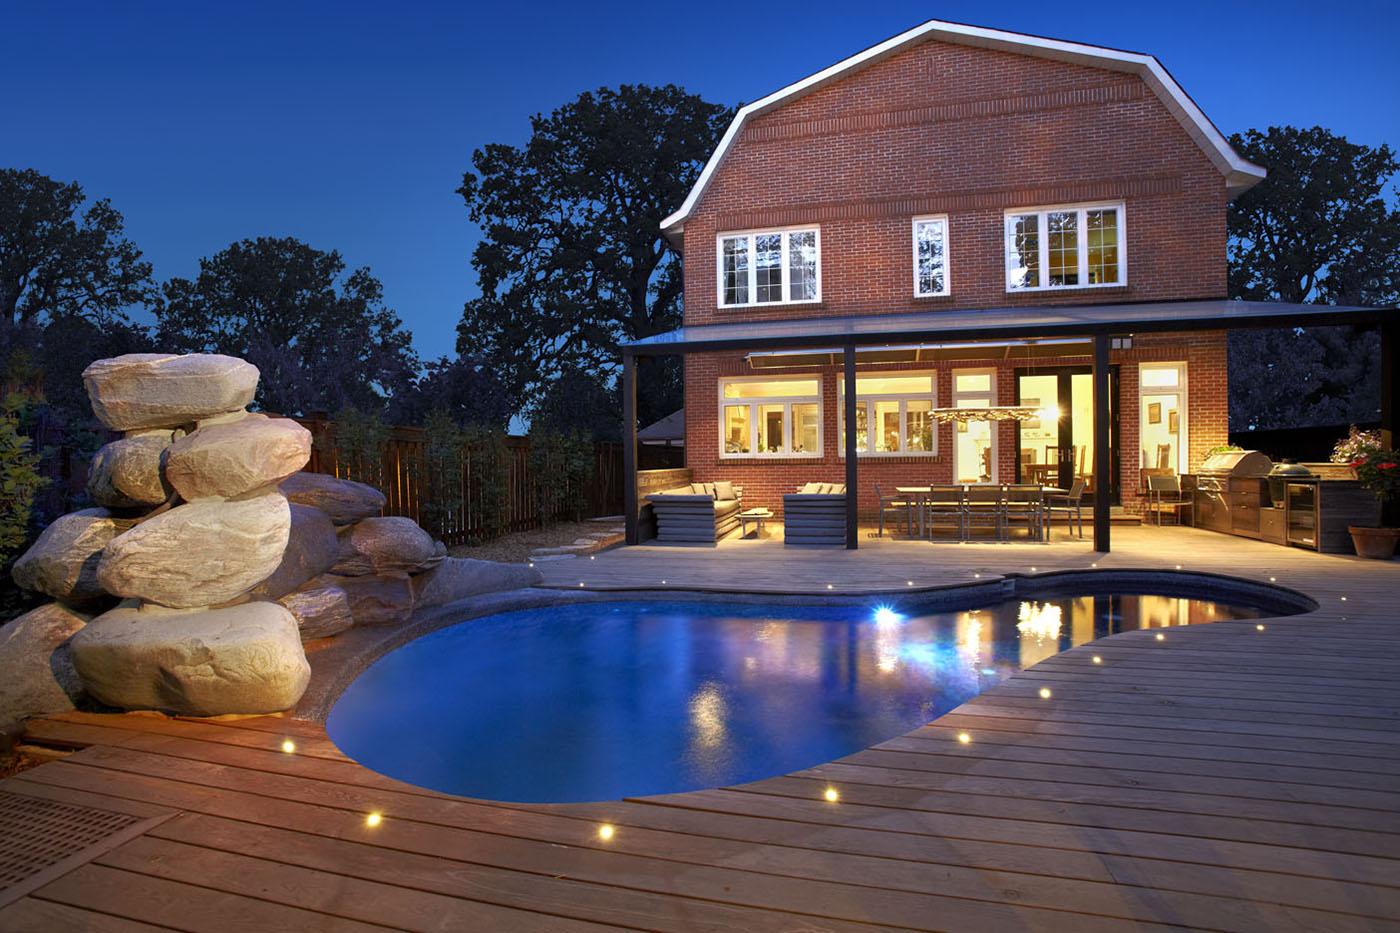 Bygg en platting med god belysning. Belysning kan løfte enhver platting til nye høyder